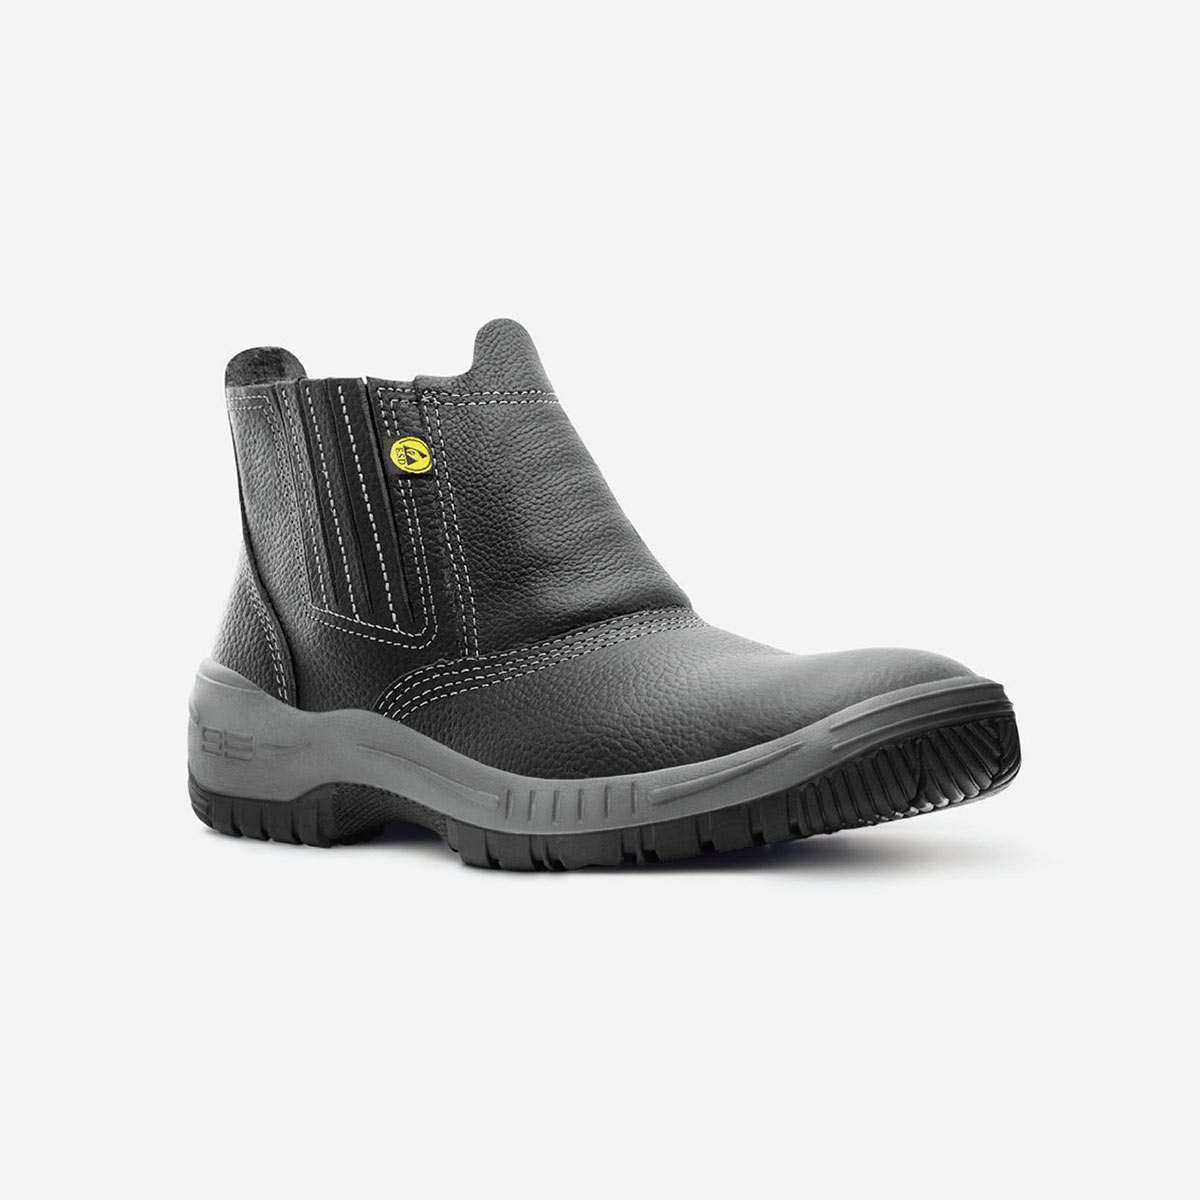 c14fd0b094b62 Sapato | MARLUVAS 90S19-BP - Granville Equipamentos de Segurança do ...